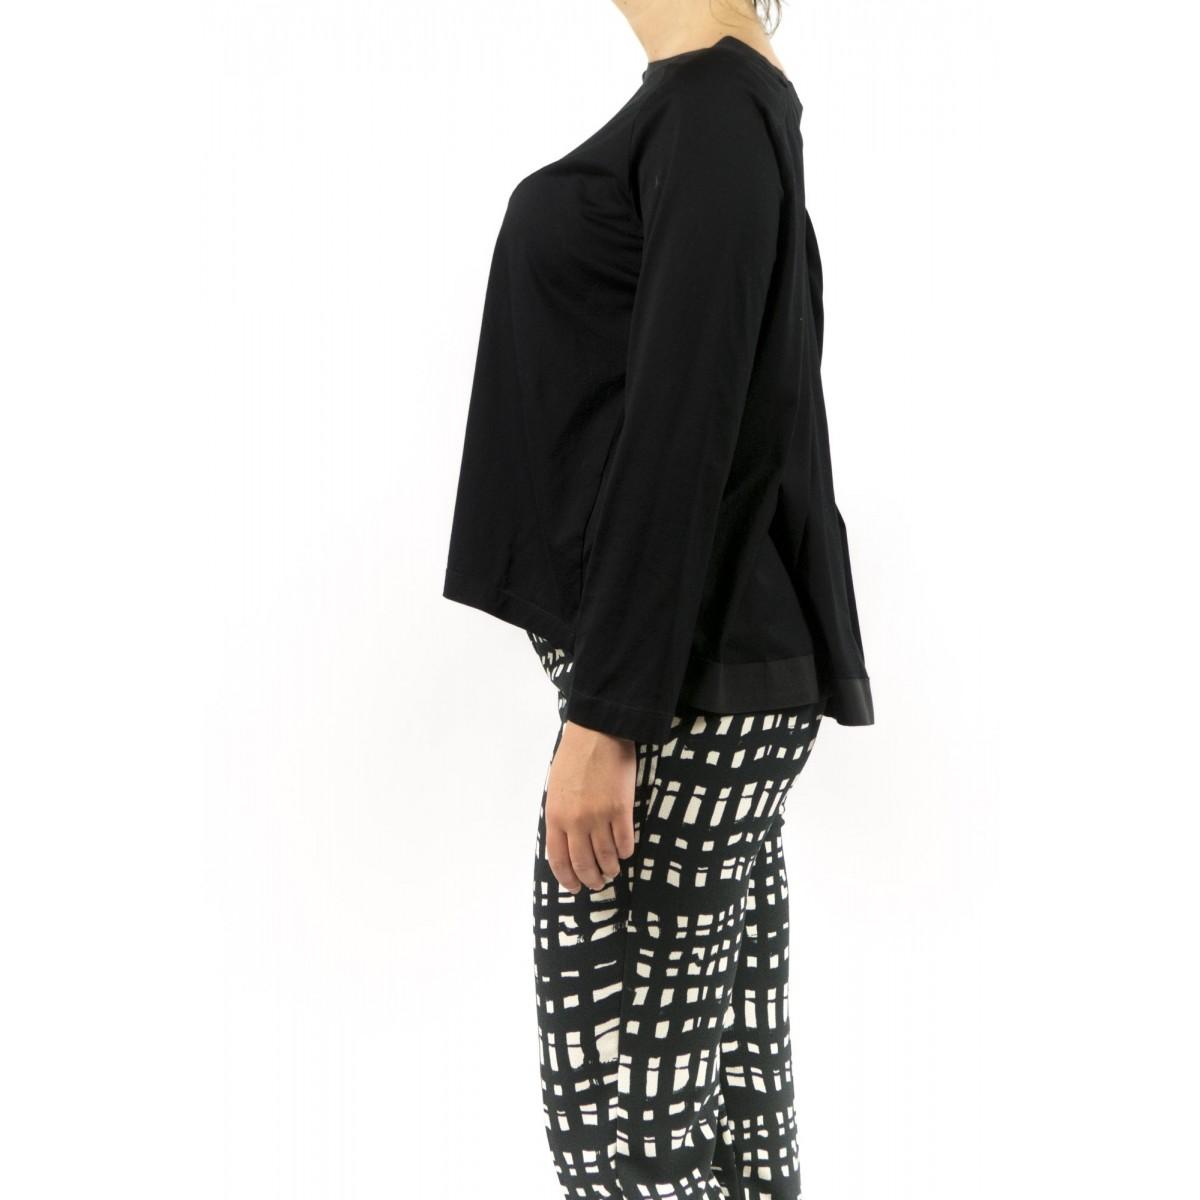 T-Shirt Erika Cavallini - Semicouture - P5I128 009 - nero